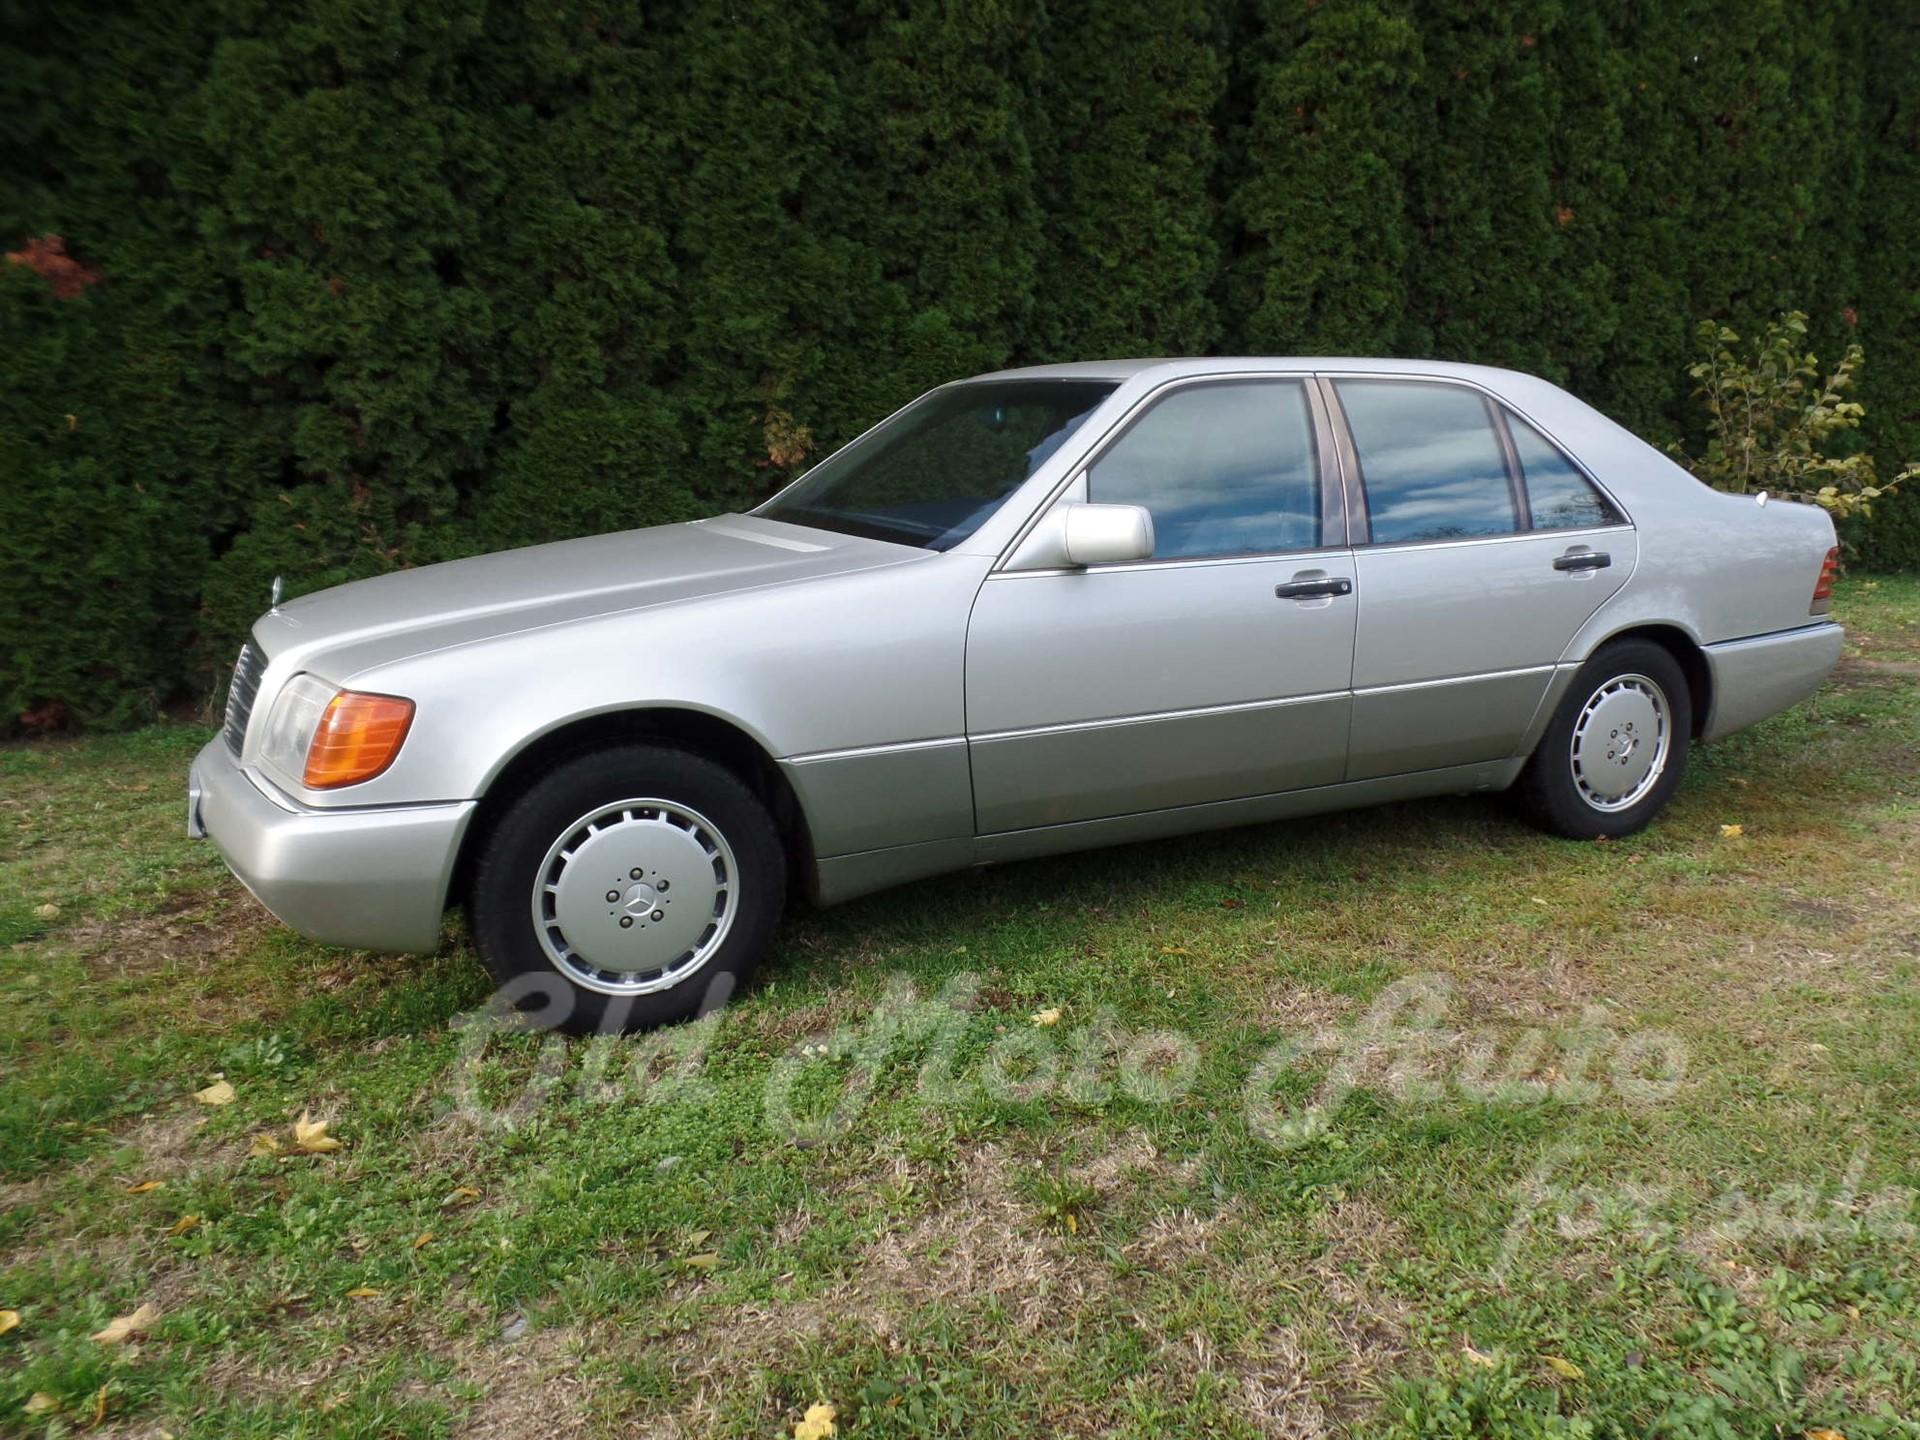 Mercedes-Benz WDB 140